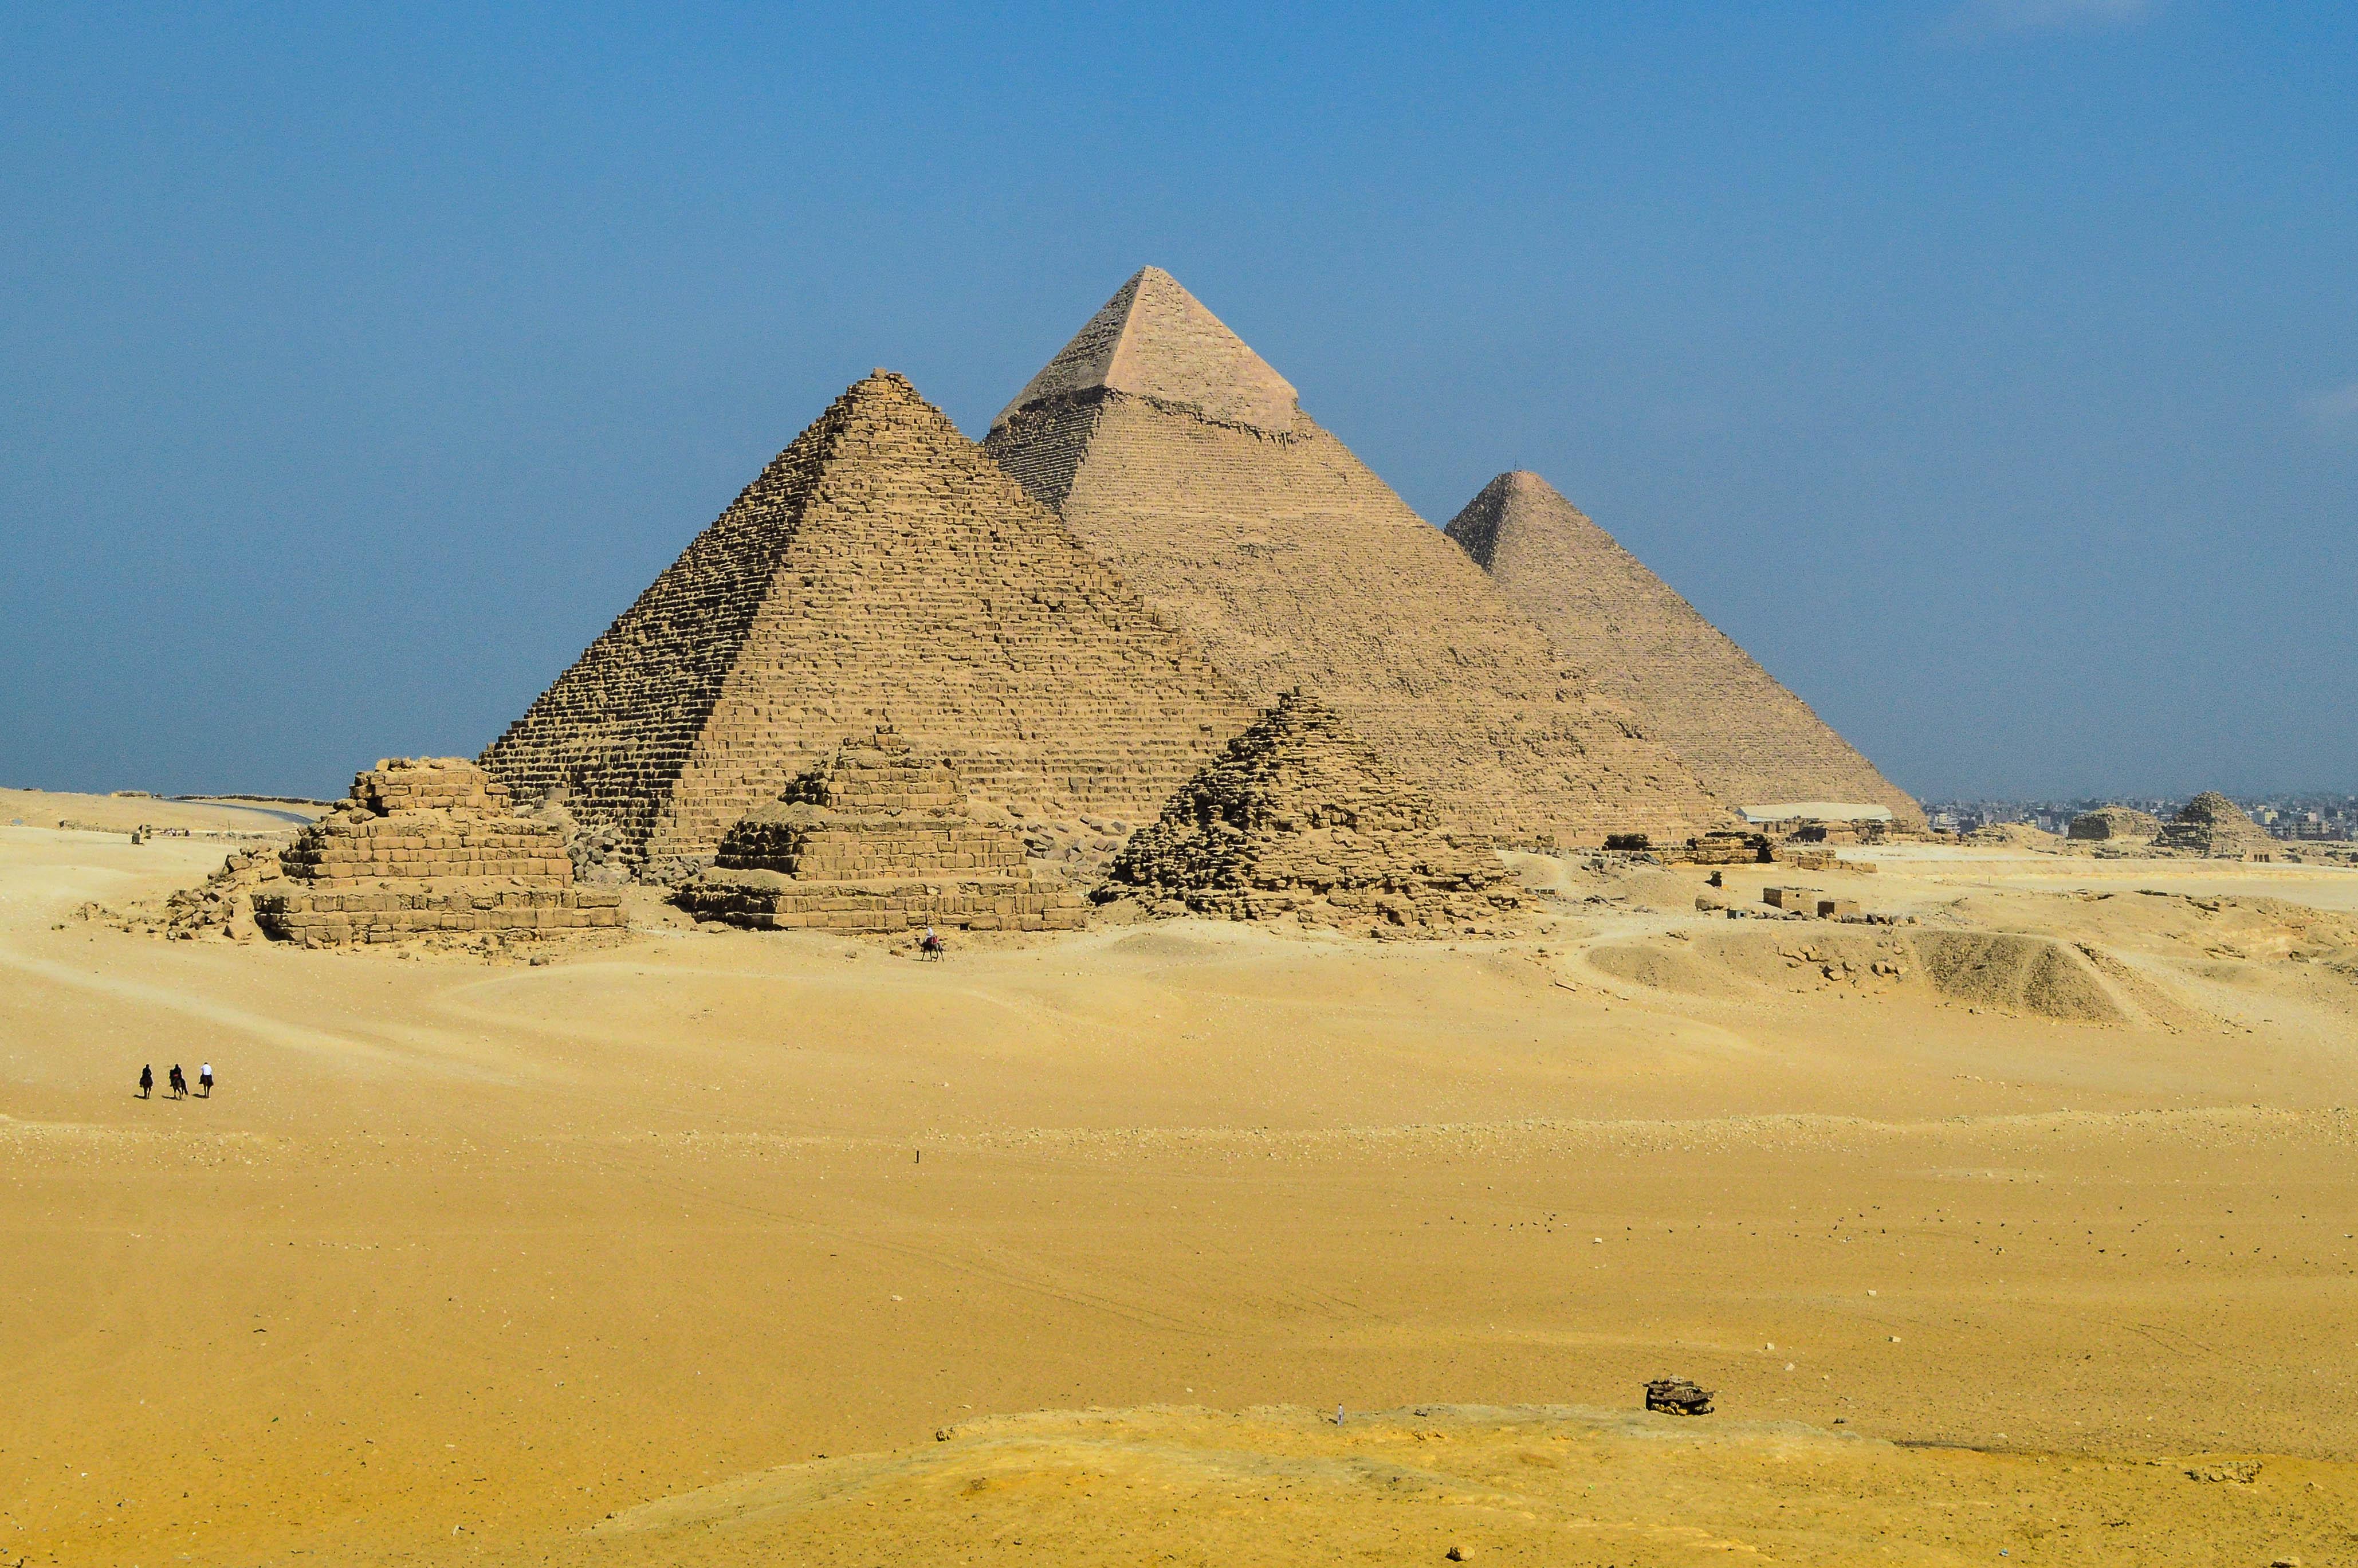 File:The Giza Pyramids.jpg - Wikimedia Commons